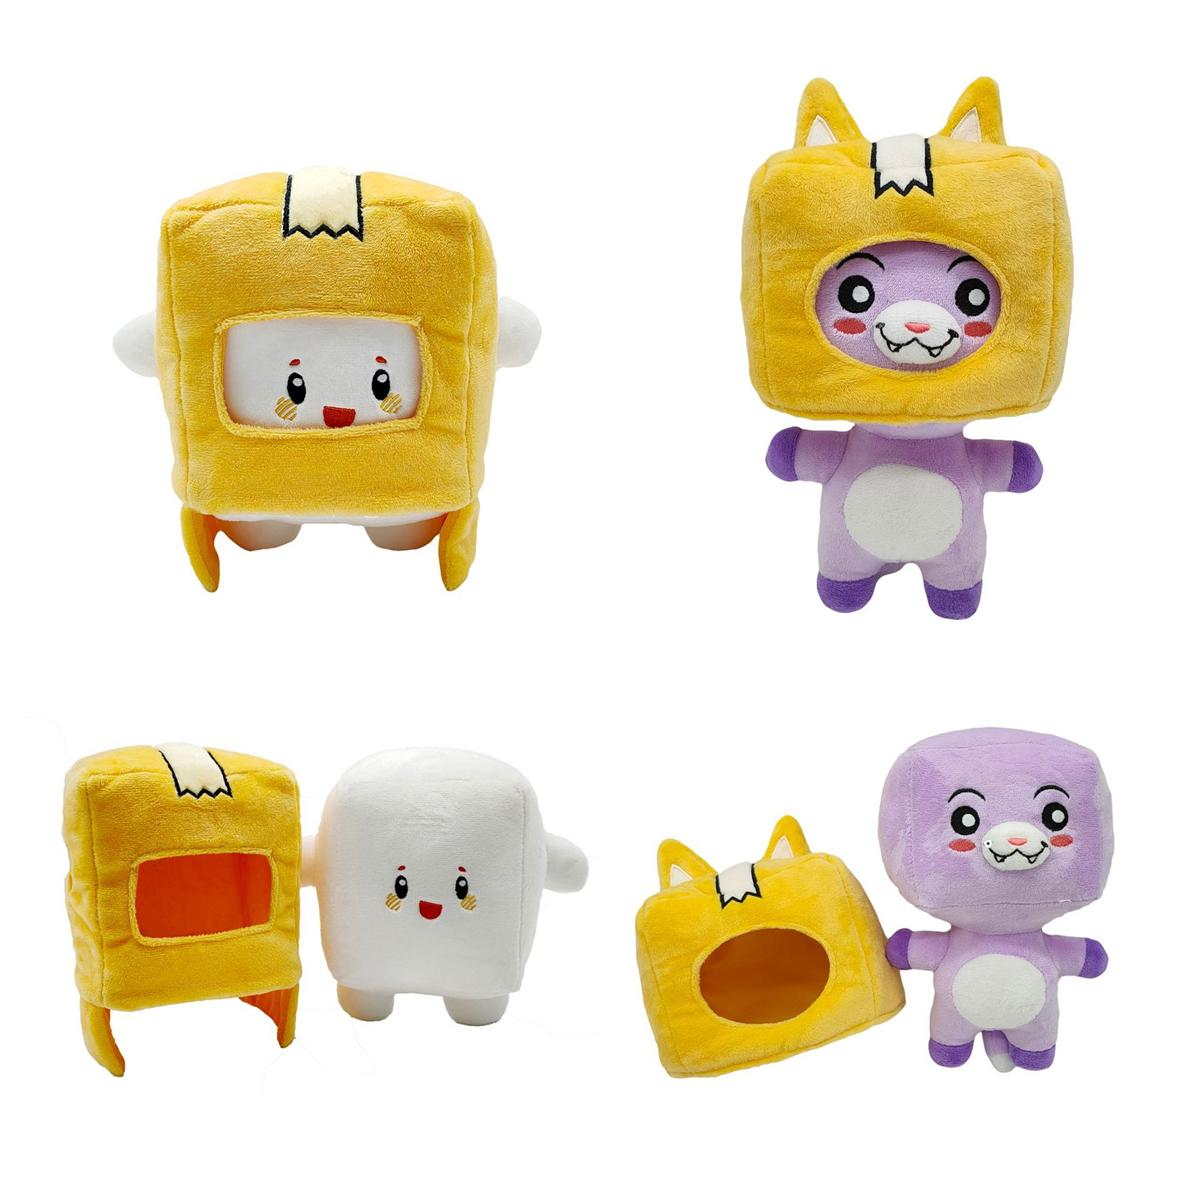 cute lankybox plush toy cartoon anime plush doll removable robot plush toys stuffed pillow dolls kid birthday gift doll toy